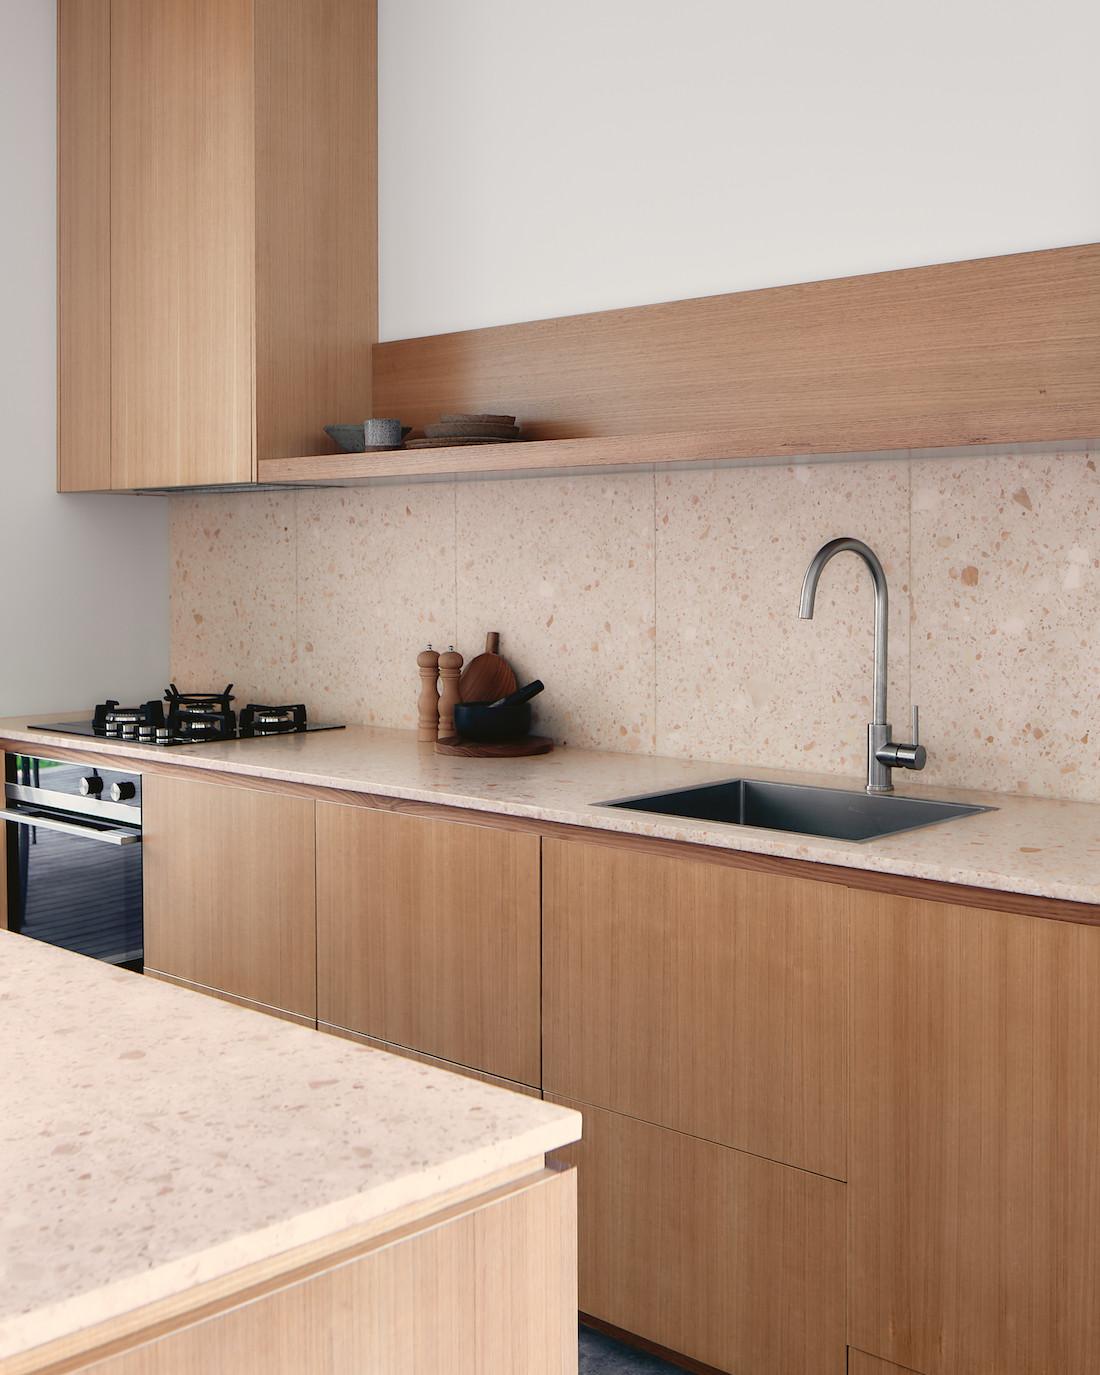 Nougat terazzo and Victorian Ash wood kitchen in A-CH's Yandina Sunrise home.